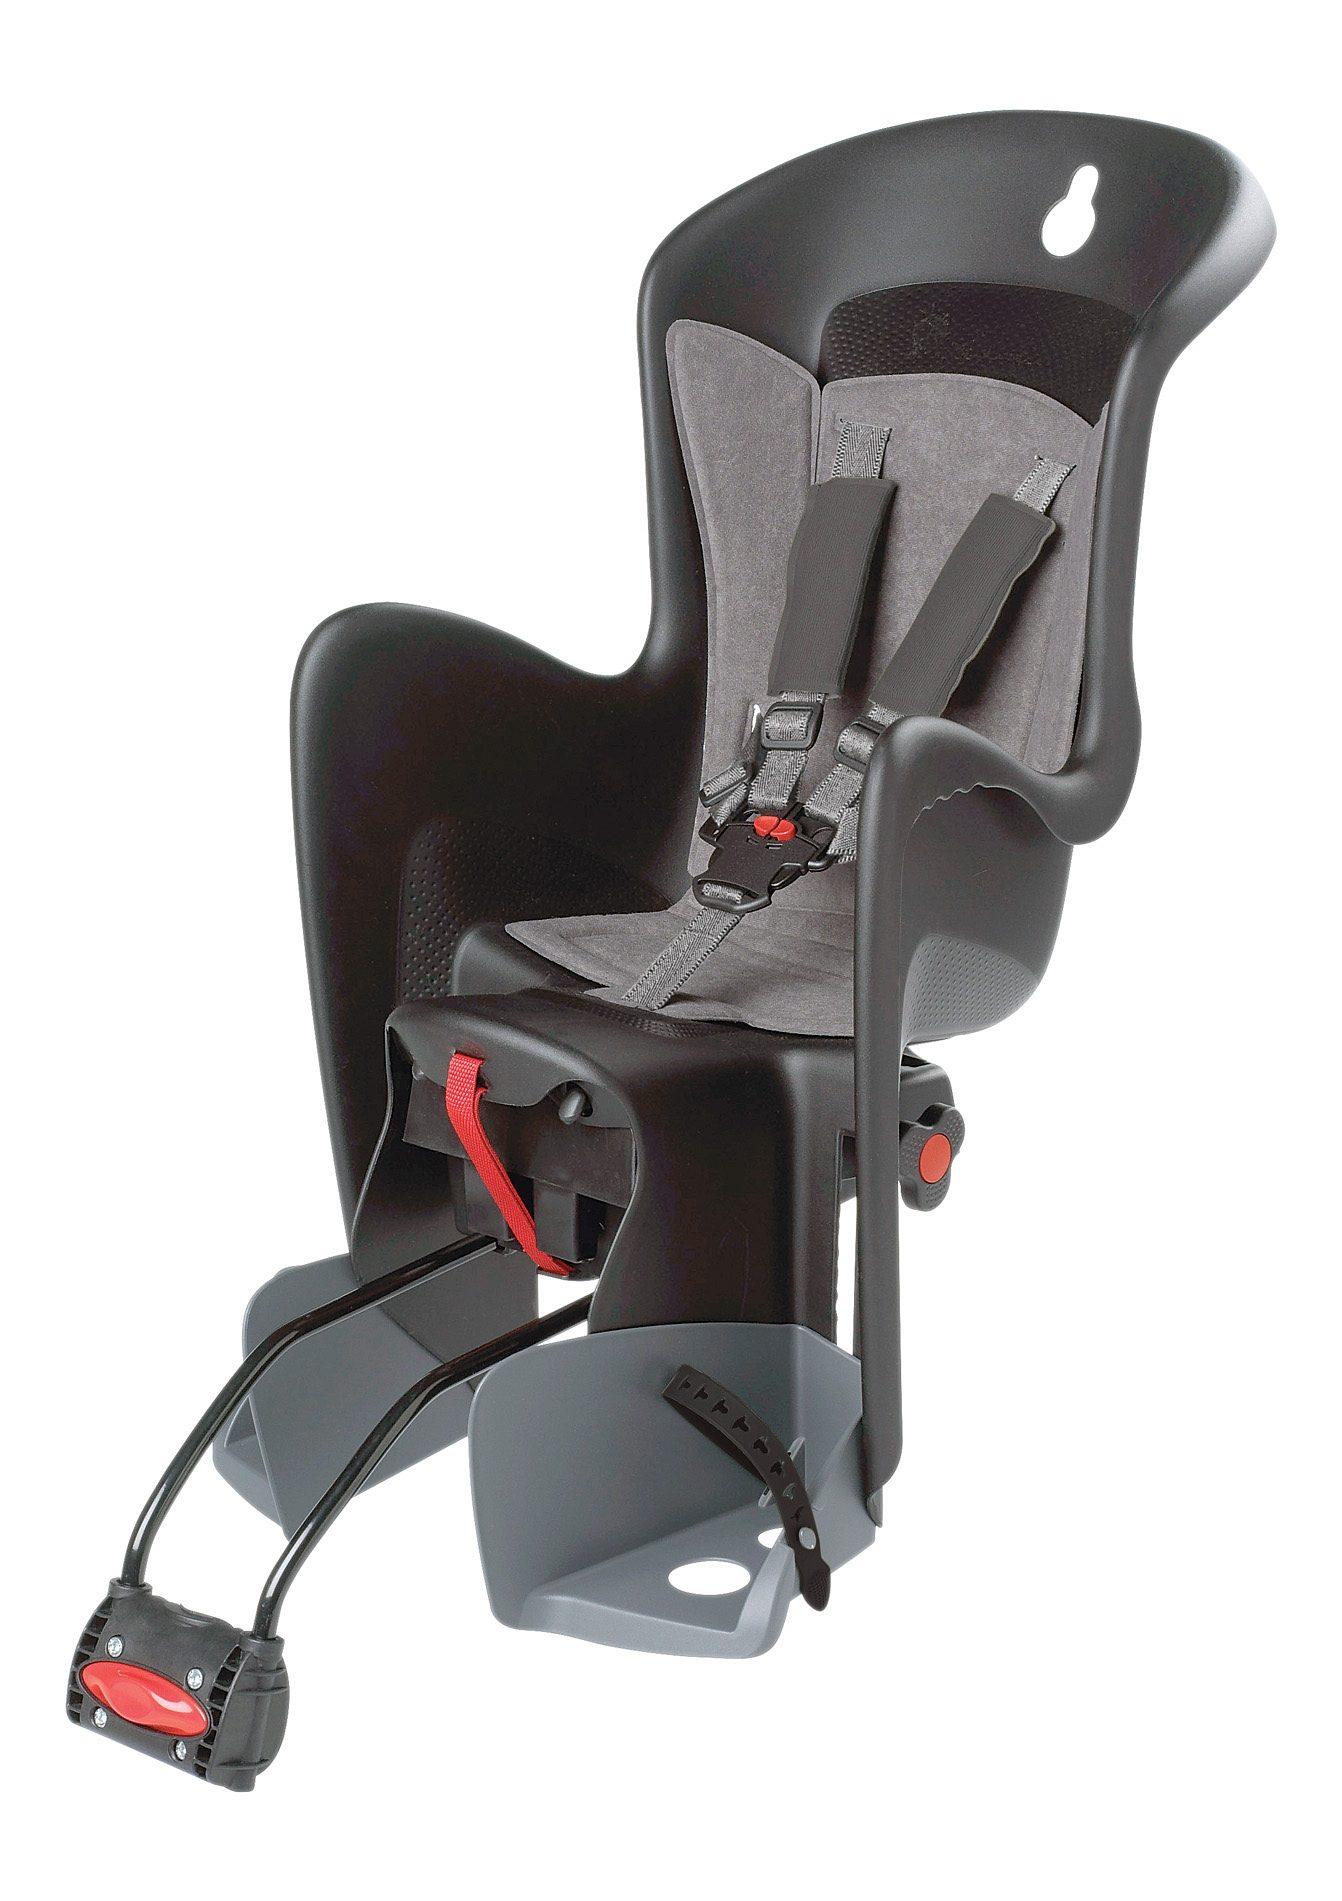 Polisport Fahrrad Kindersitz, schwarz-grau, »Bilby«